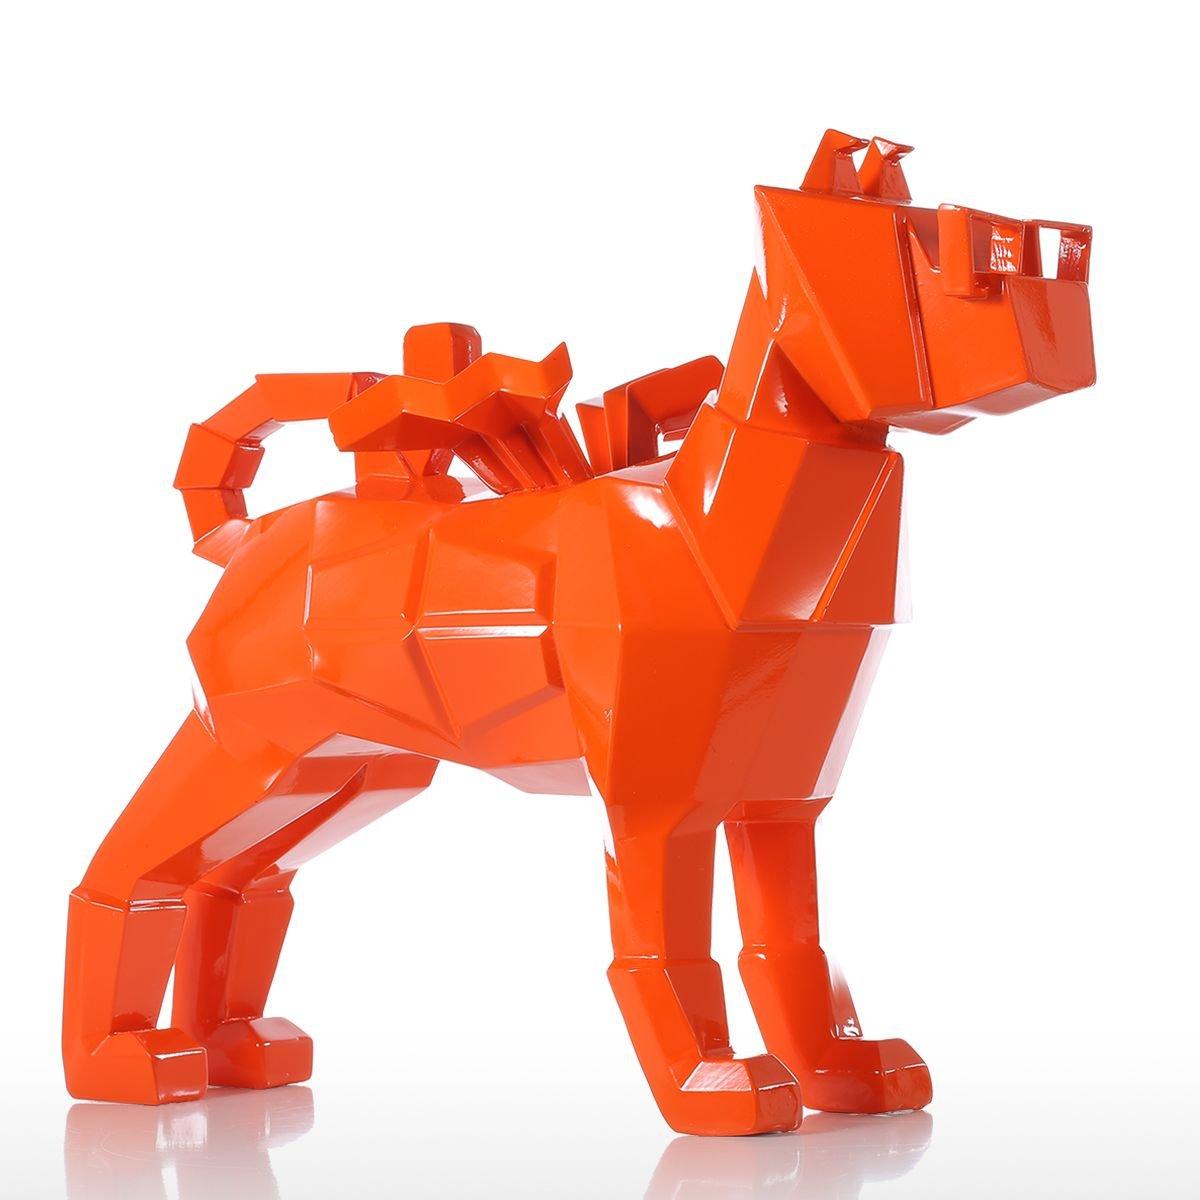 Tomfeel Glasses Dog Gold Resin Sculpture Fiberglass Puppy